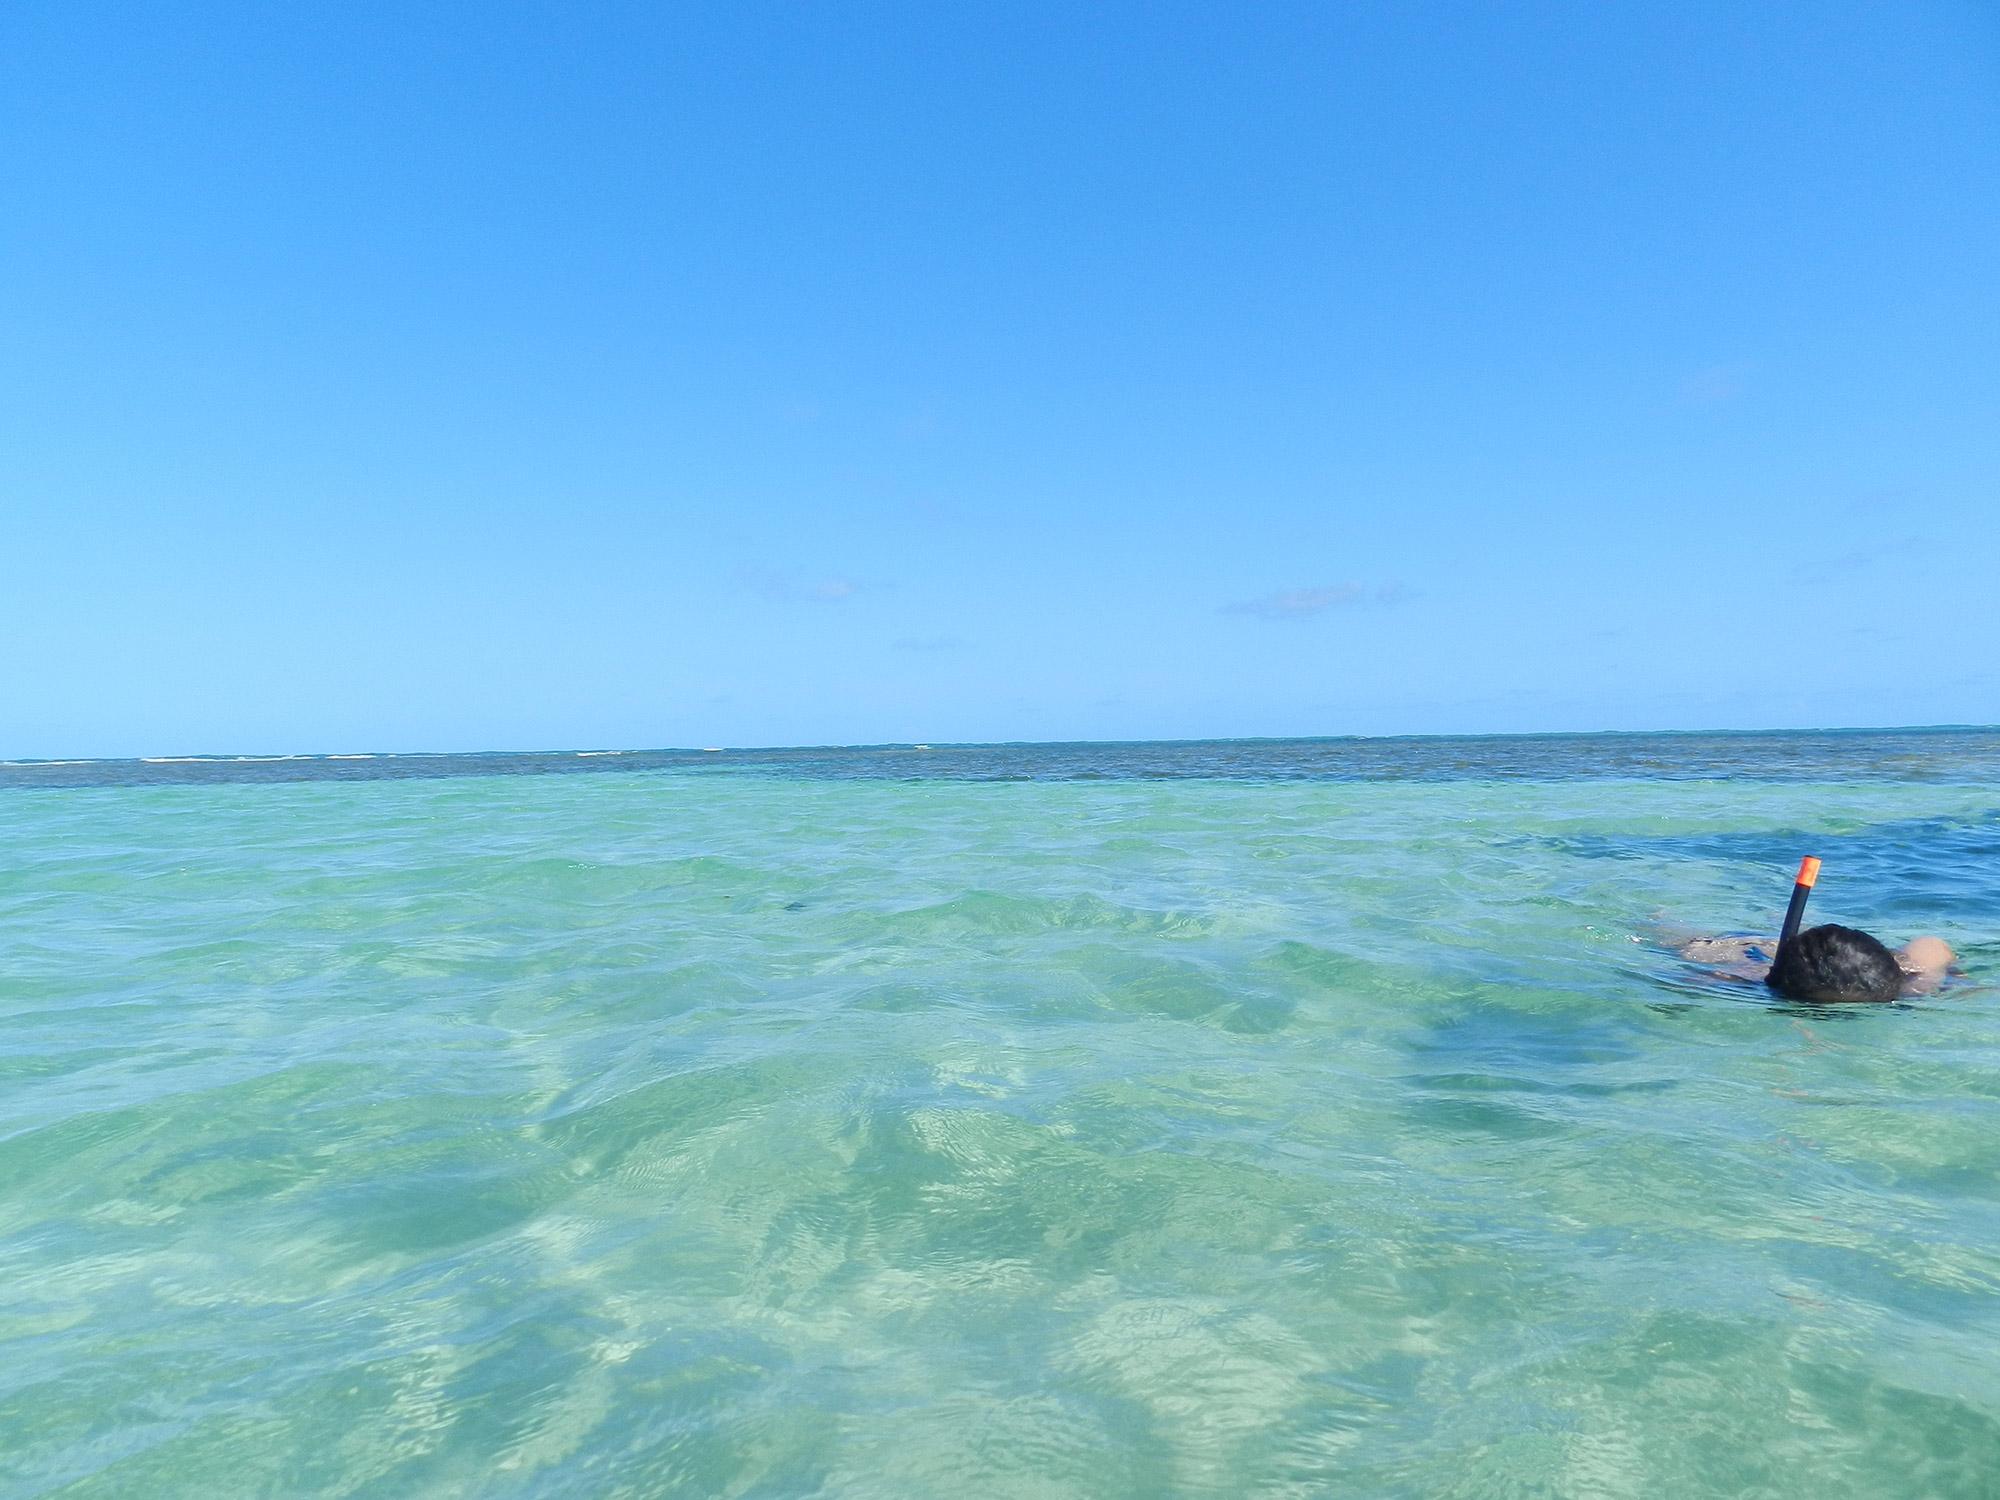 Piscinas naturais da Praia do Patacho (AL)